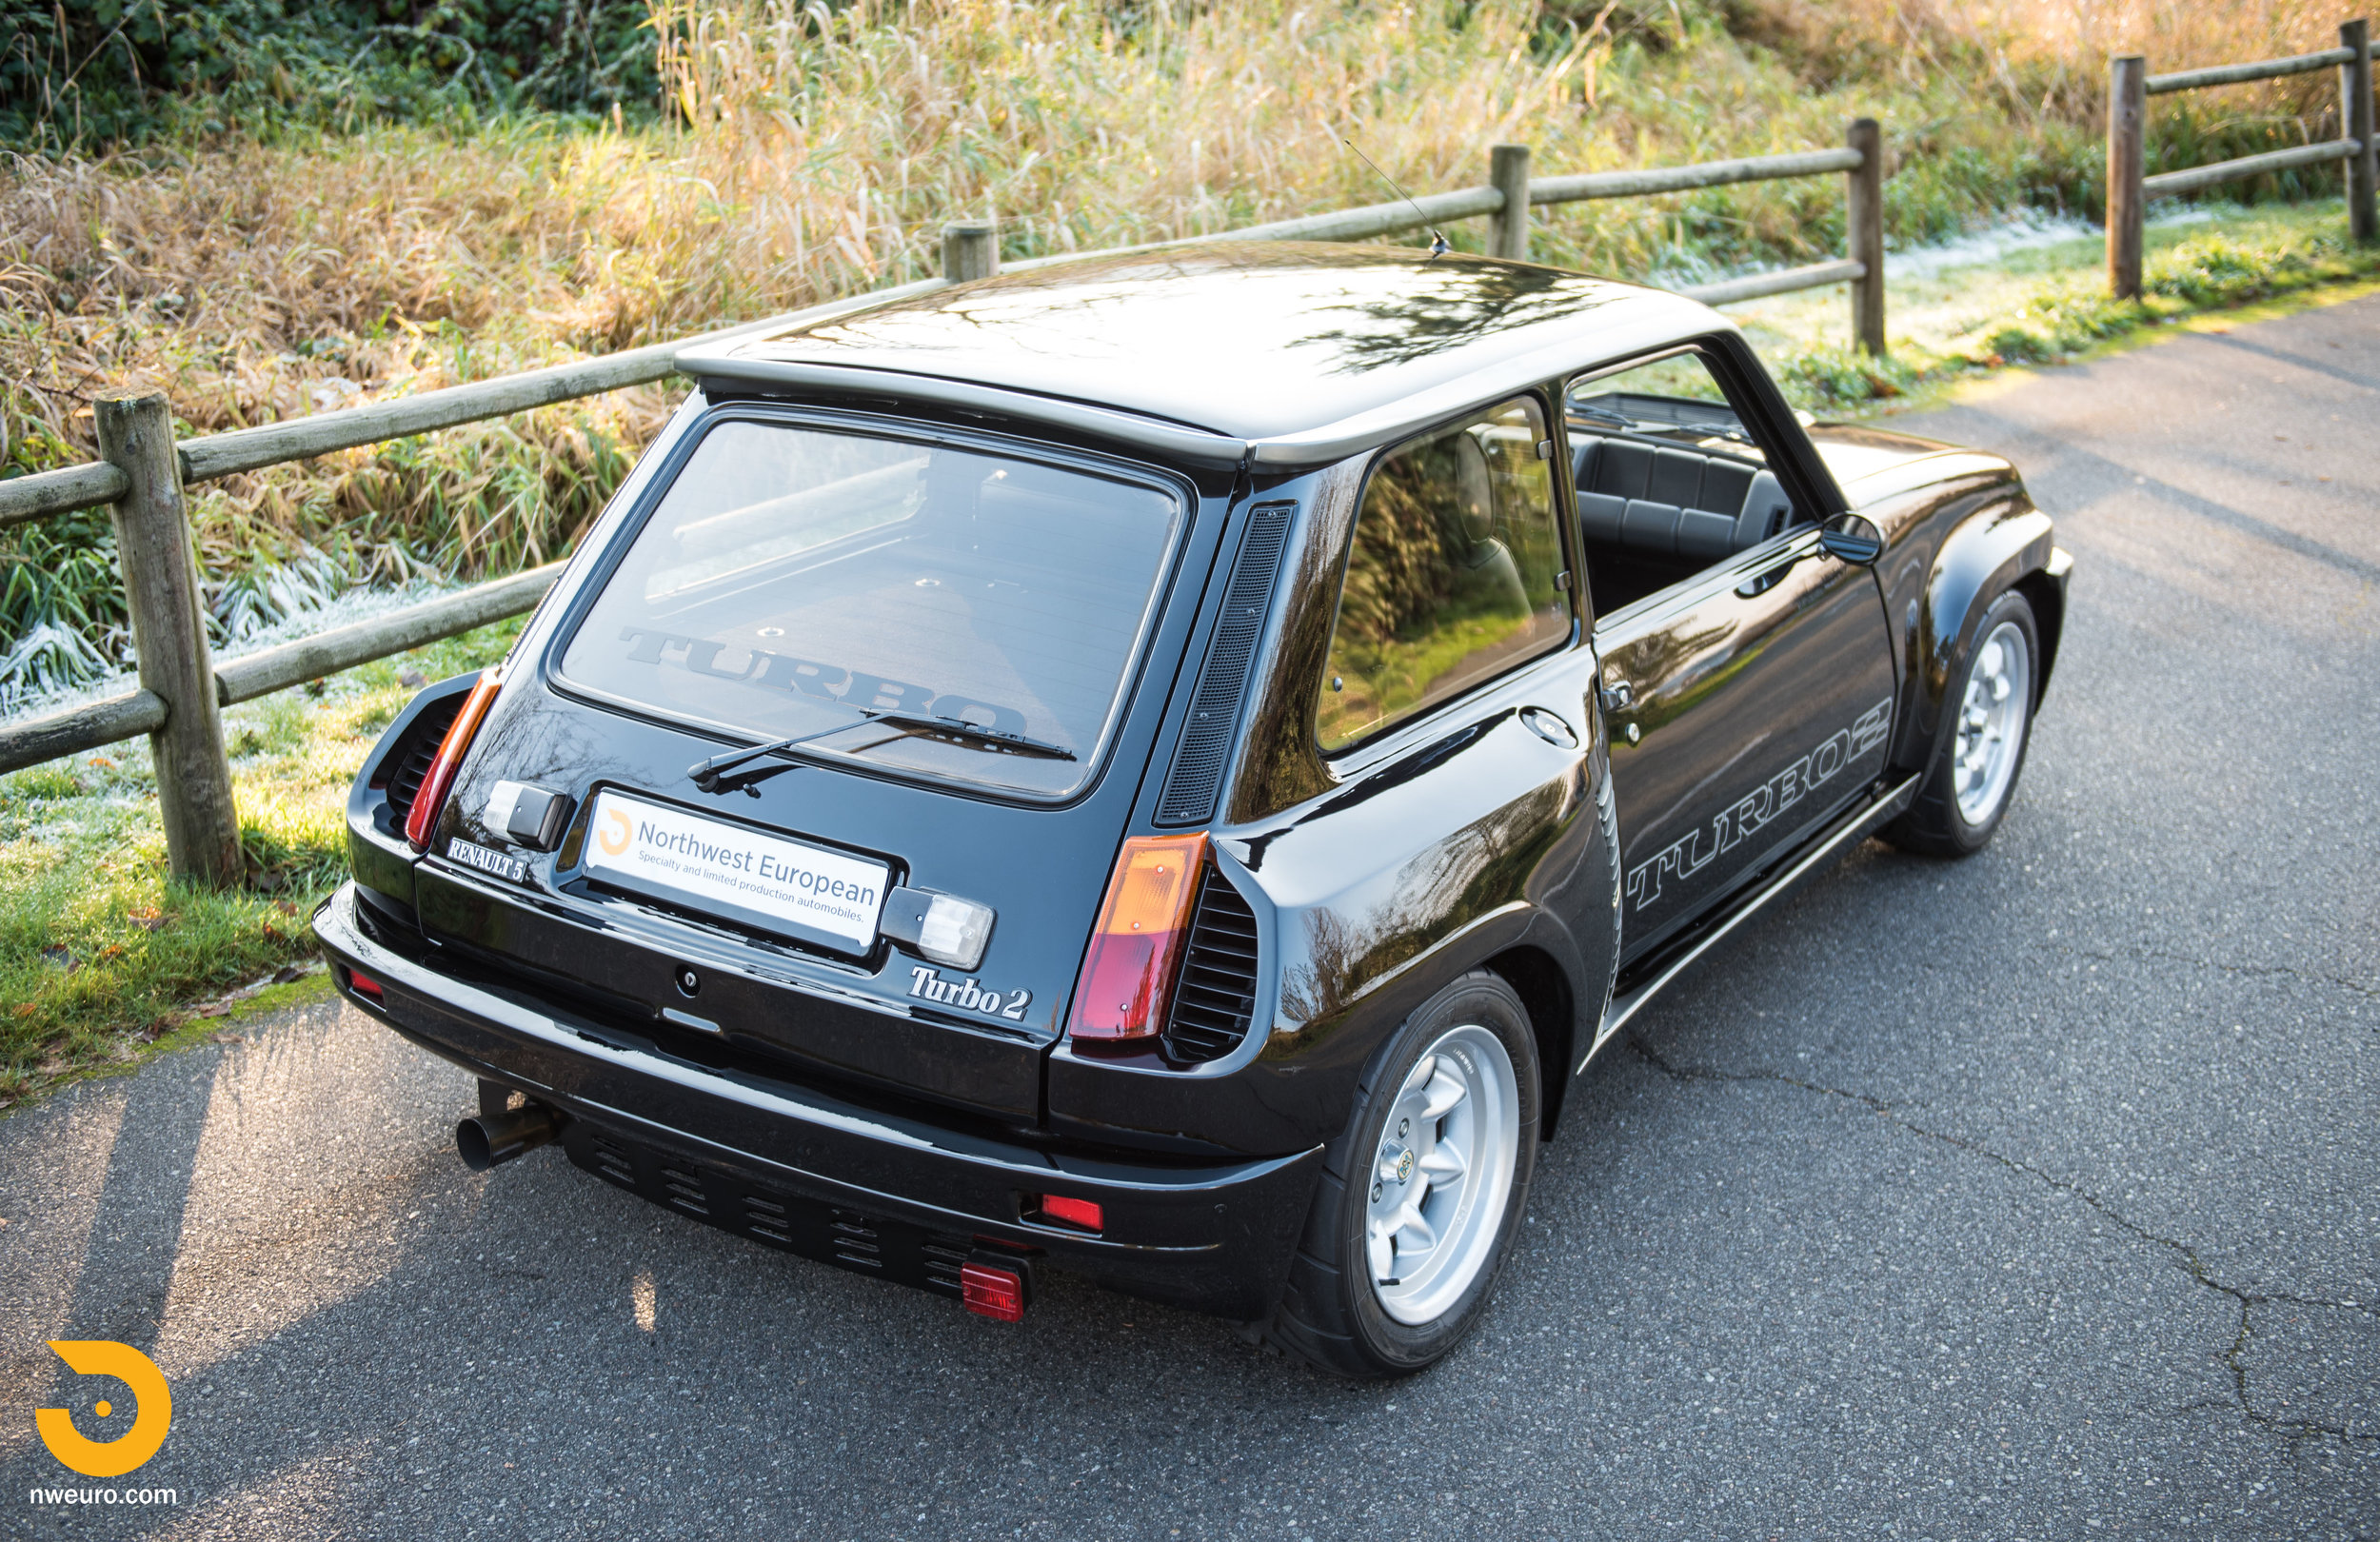 1983 Renault R5 Turbo 2 Black at Park-7.jpg